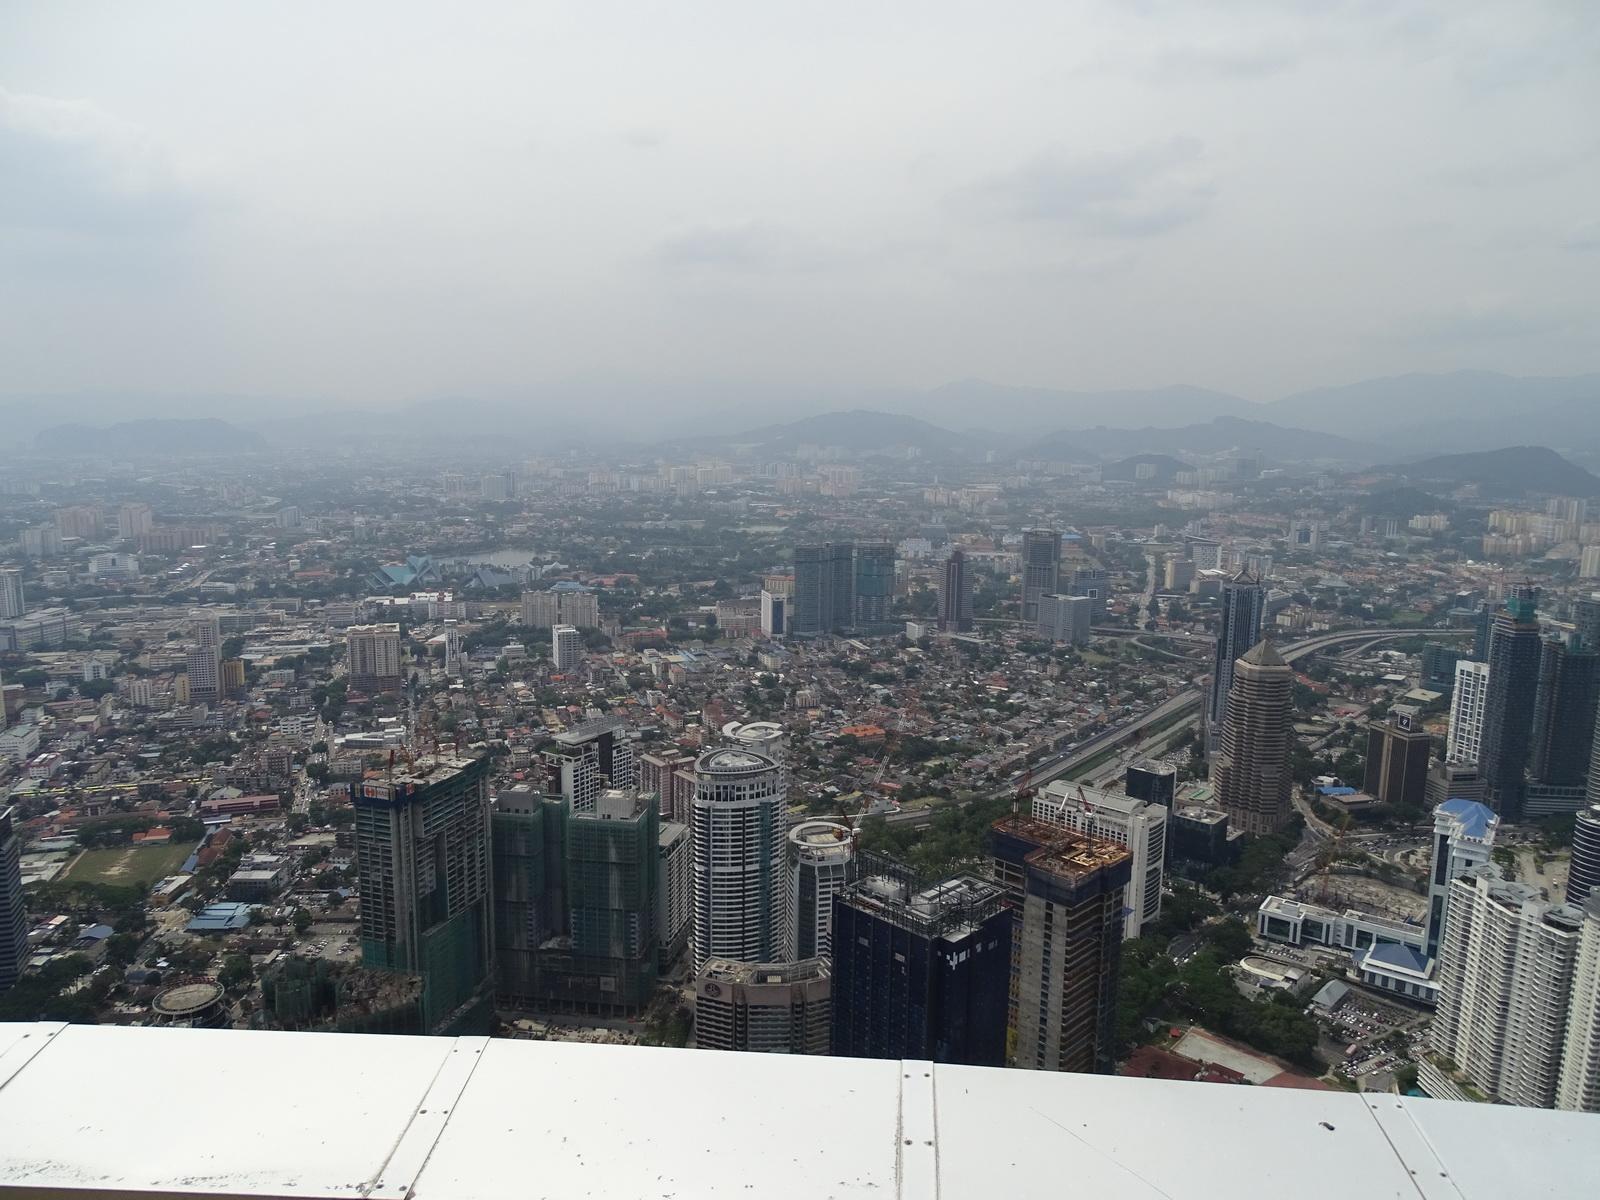 05 KL Tower 09